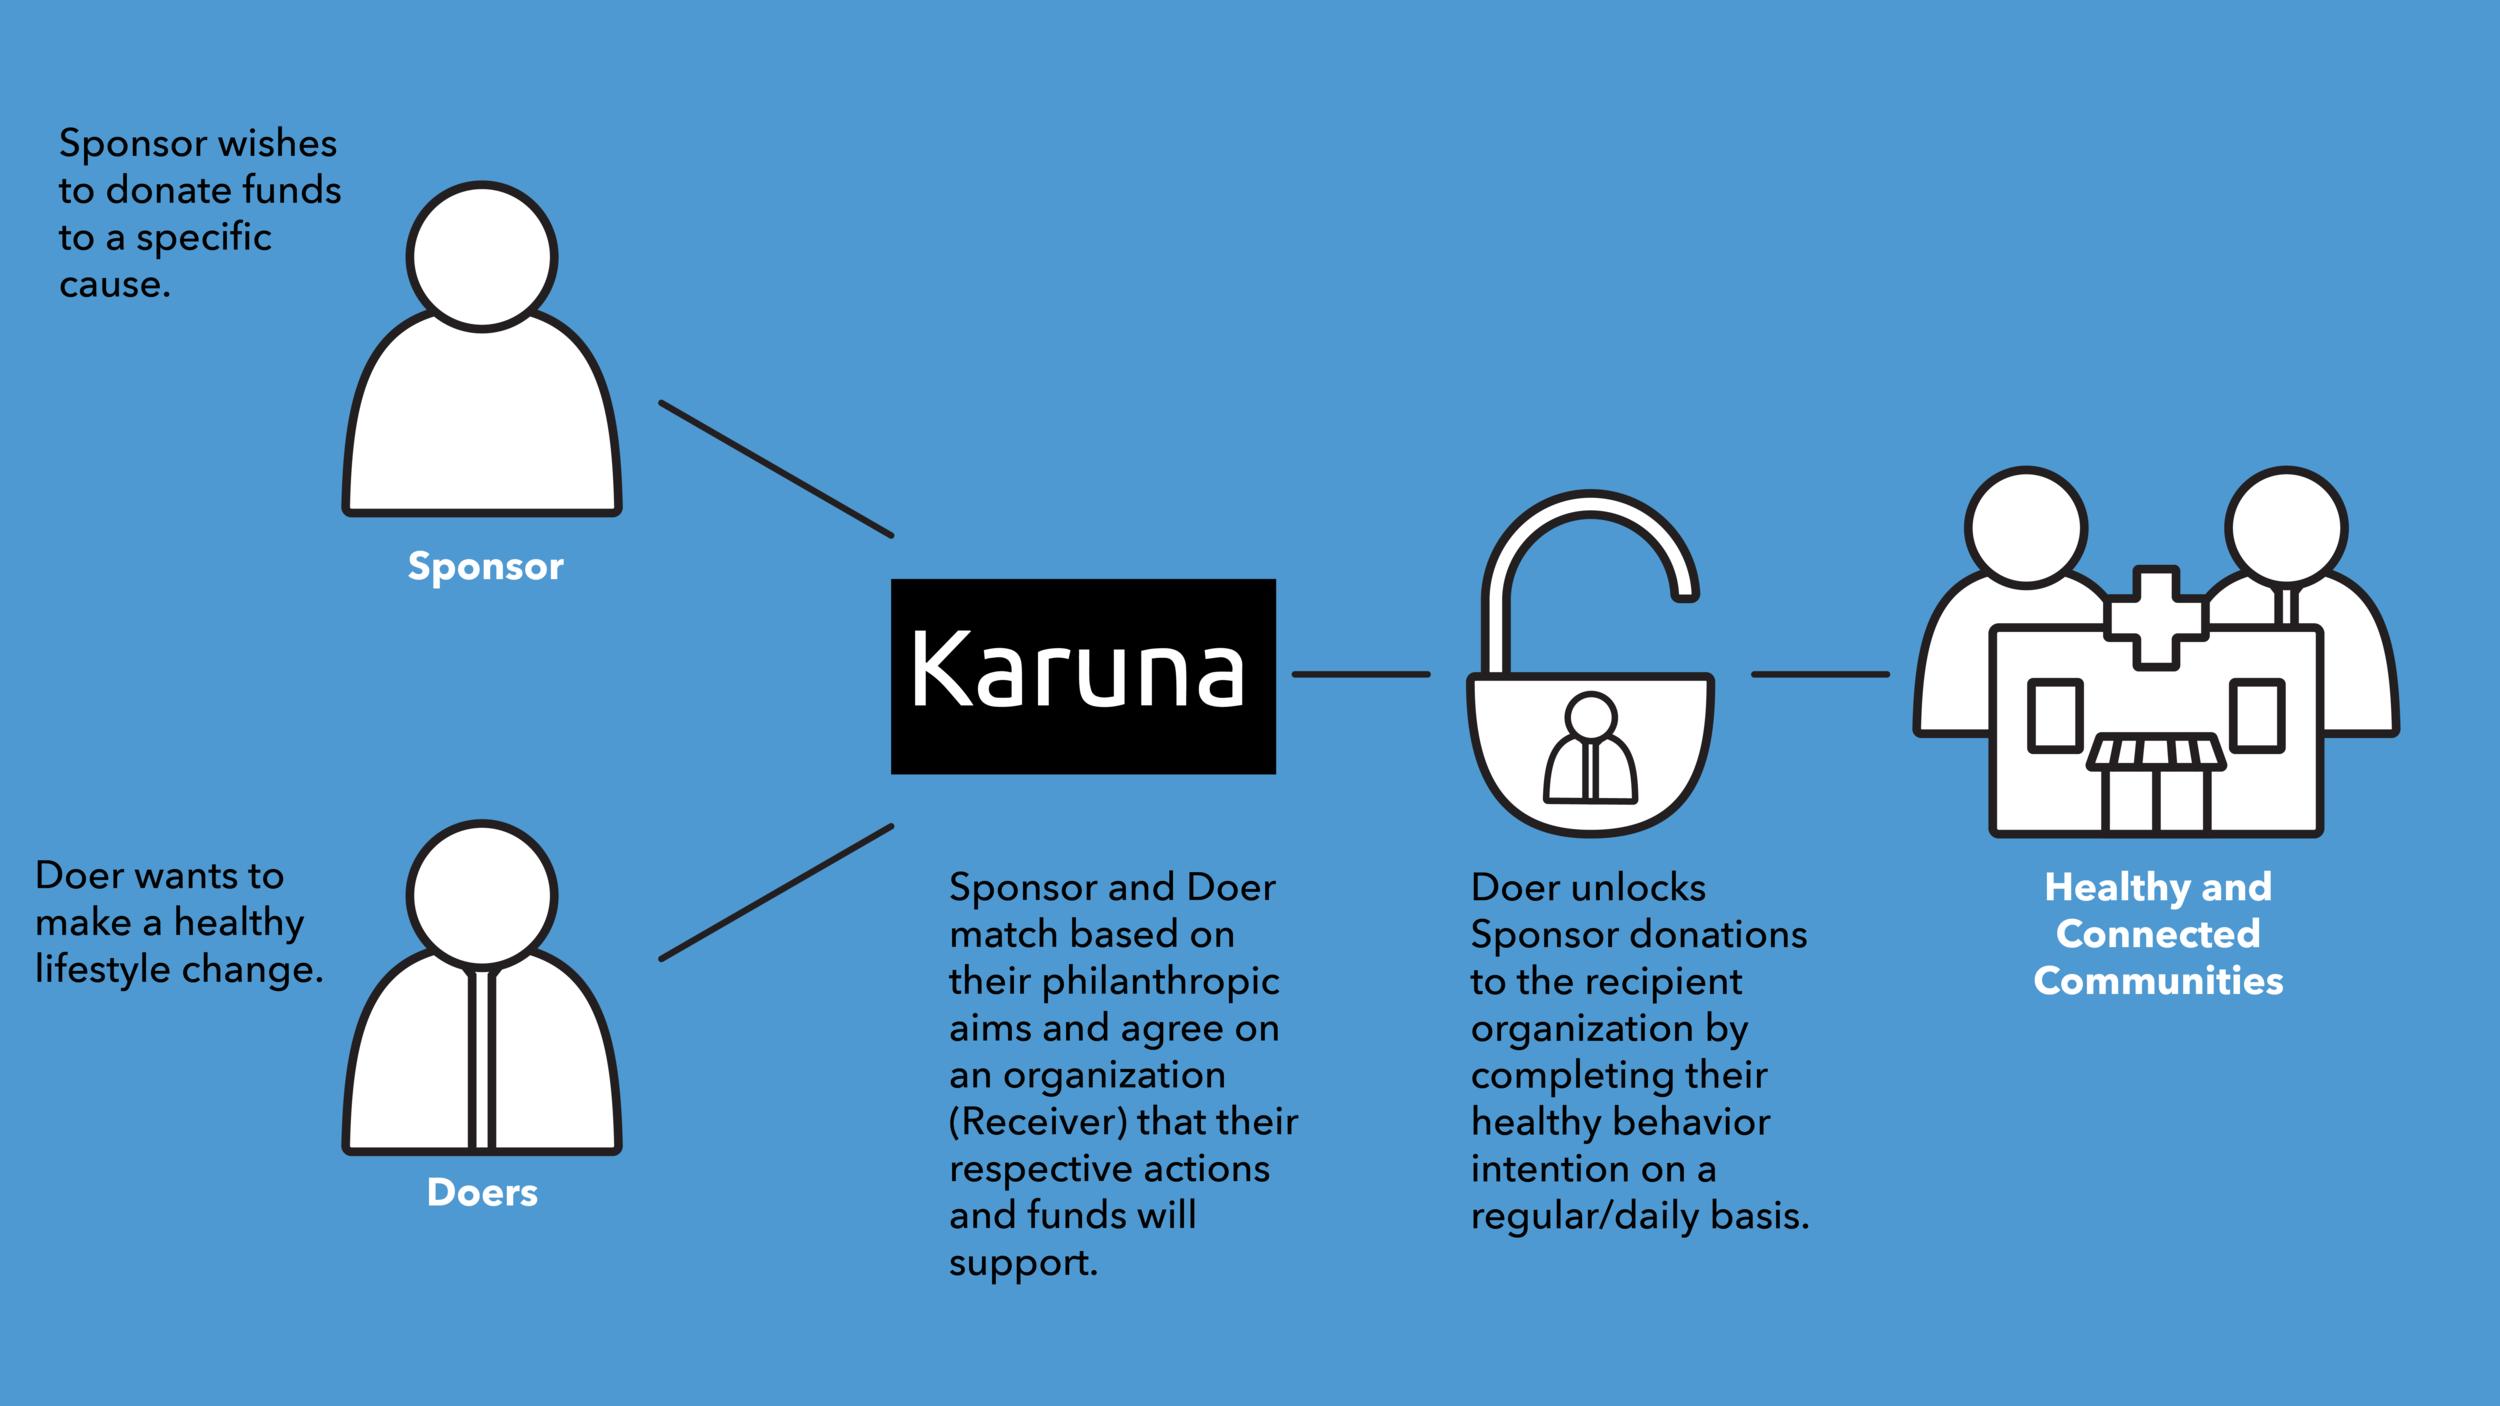 Karuna_Infographic_Karuna Graphic.png